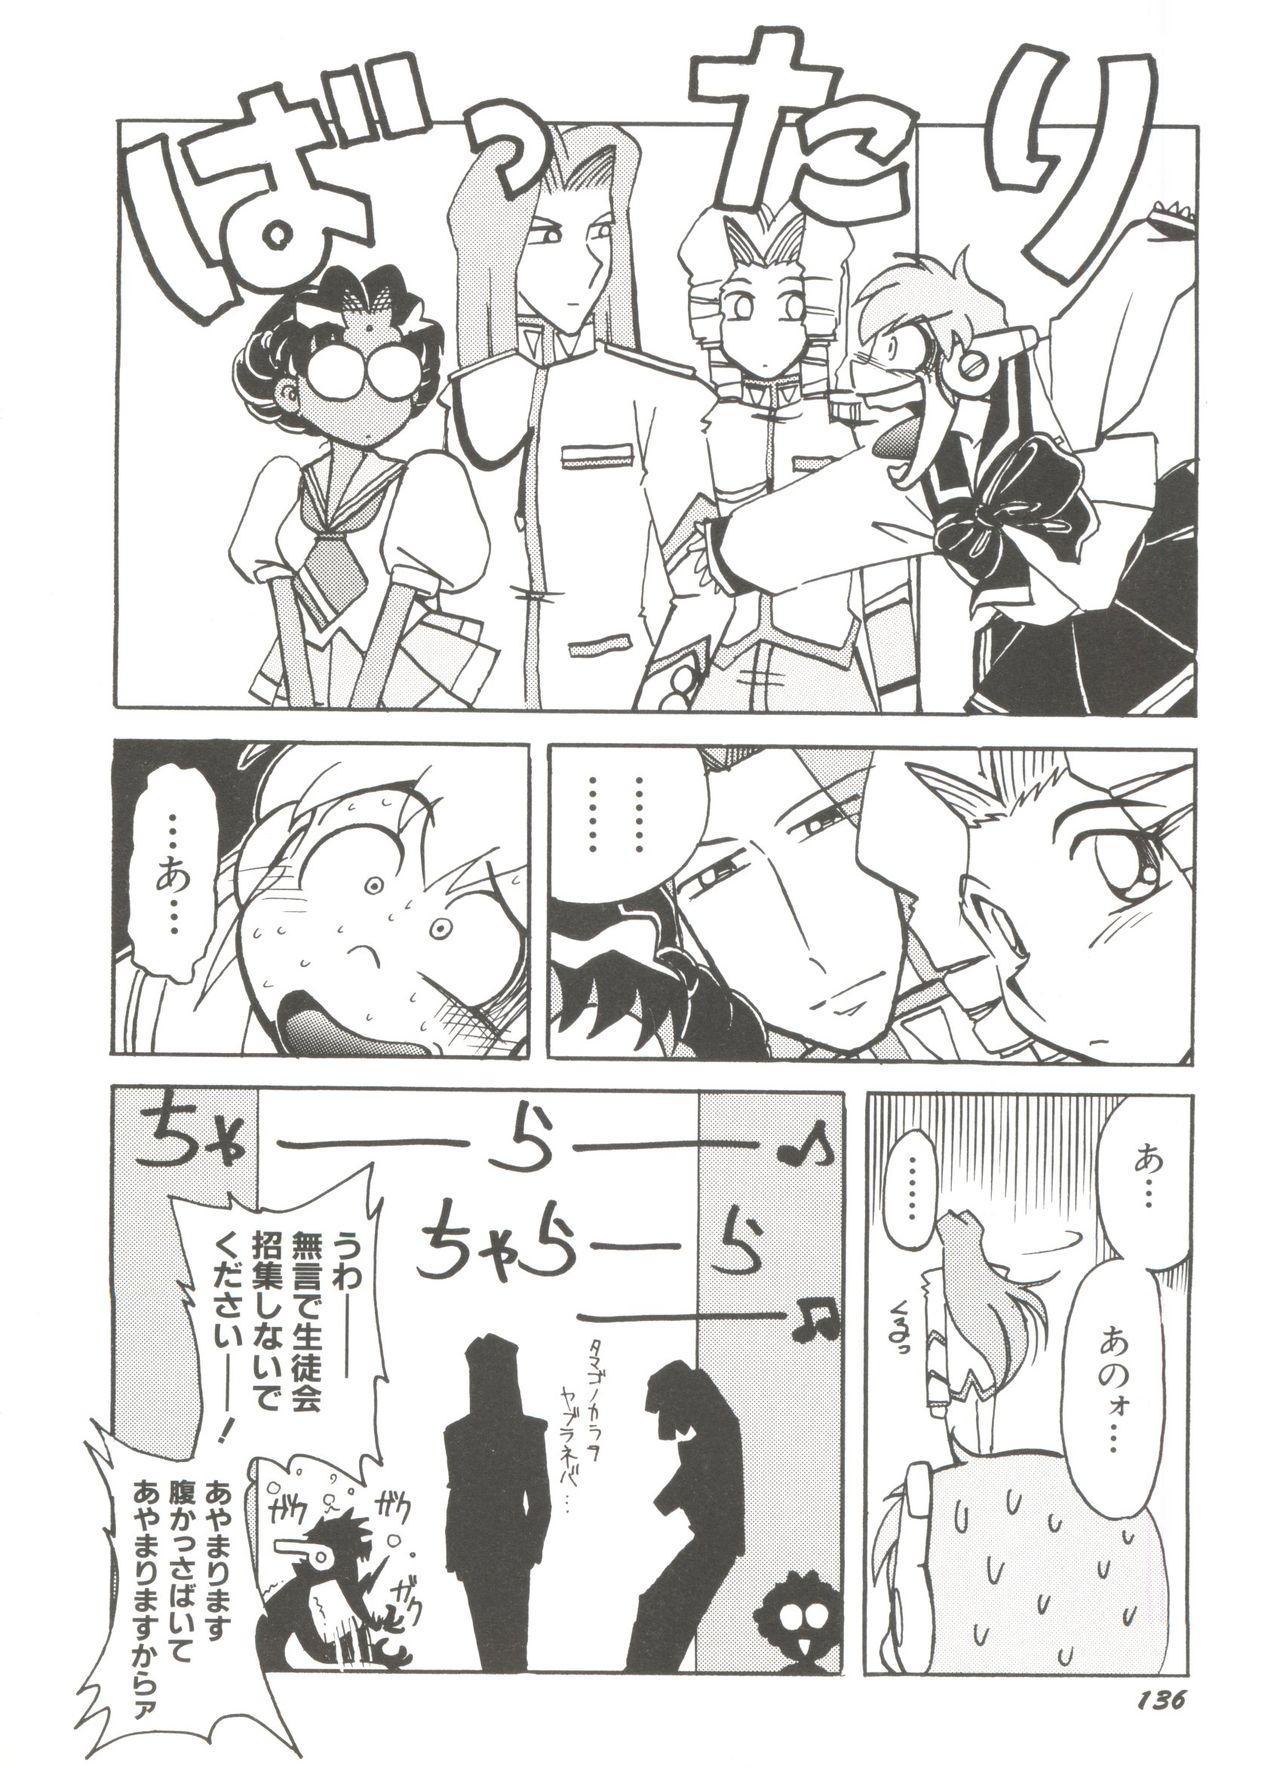 [Anthology] Denei Tamatebako 8 - Utakata no Tenshi-tachi II (Various) 137